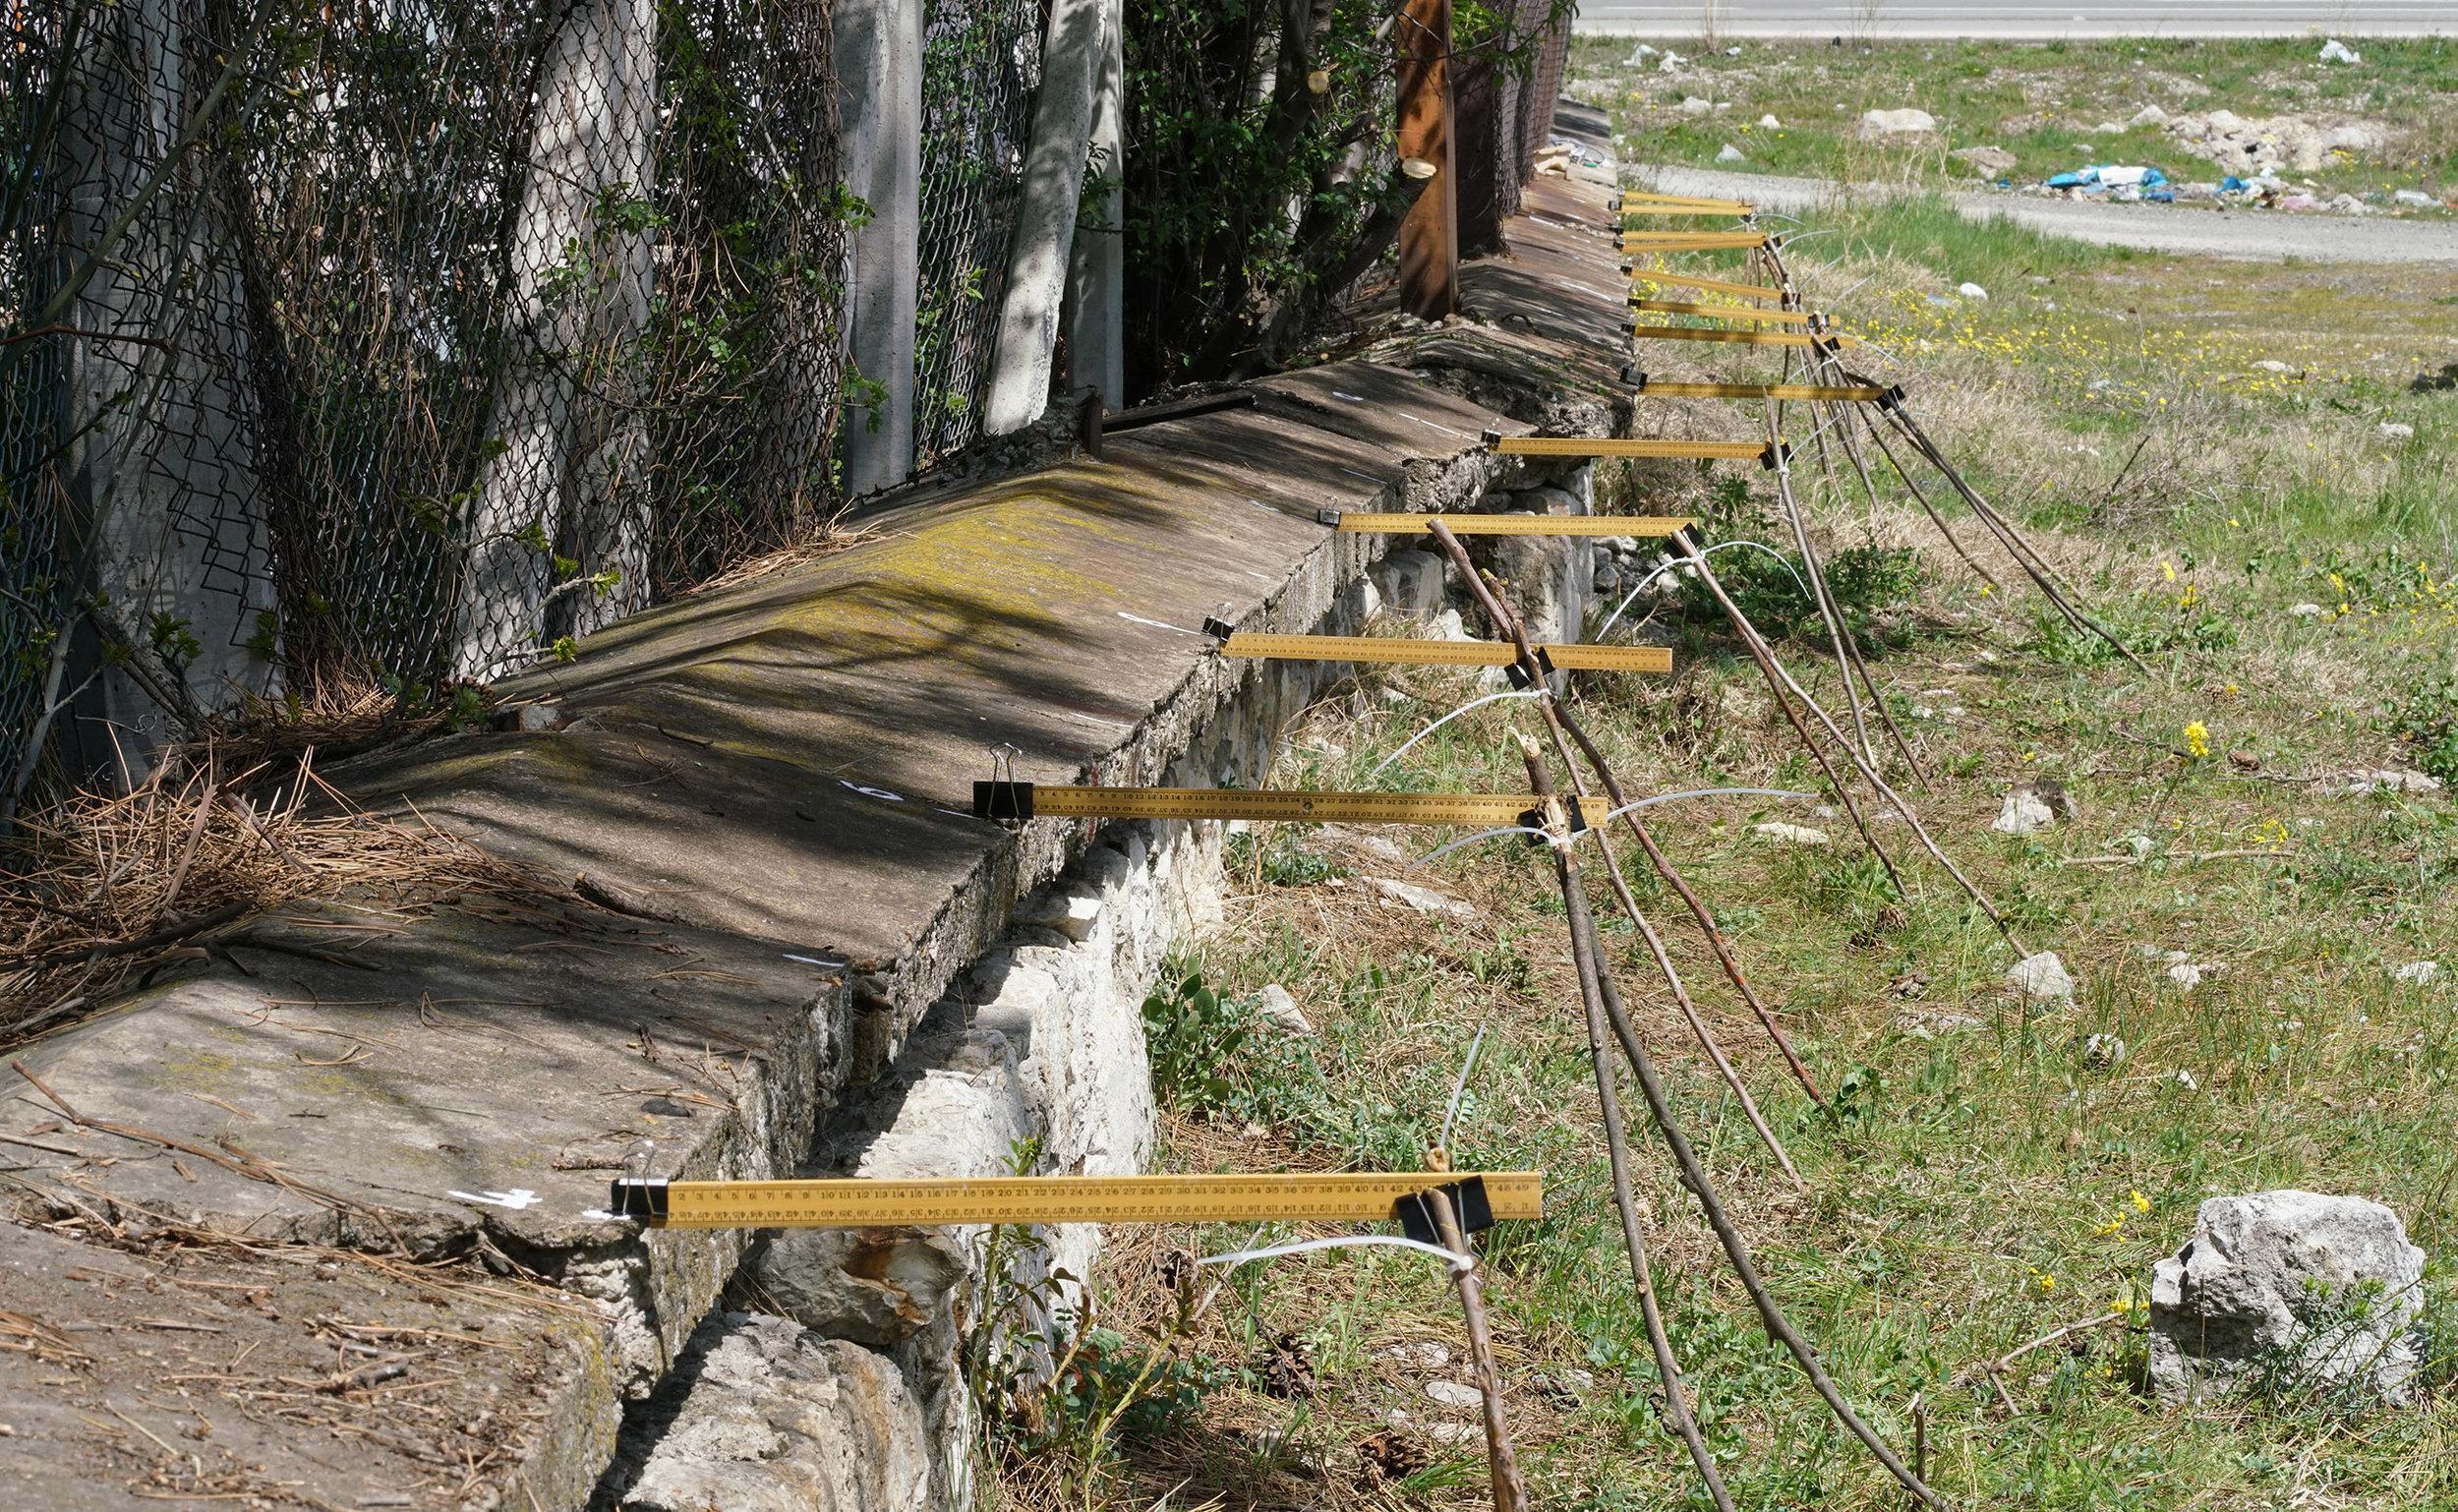 Stone Walls, Railway Lines and Carbon Fibers Record Turkey's Westward Drift (Oct. 2016)